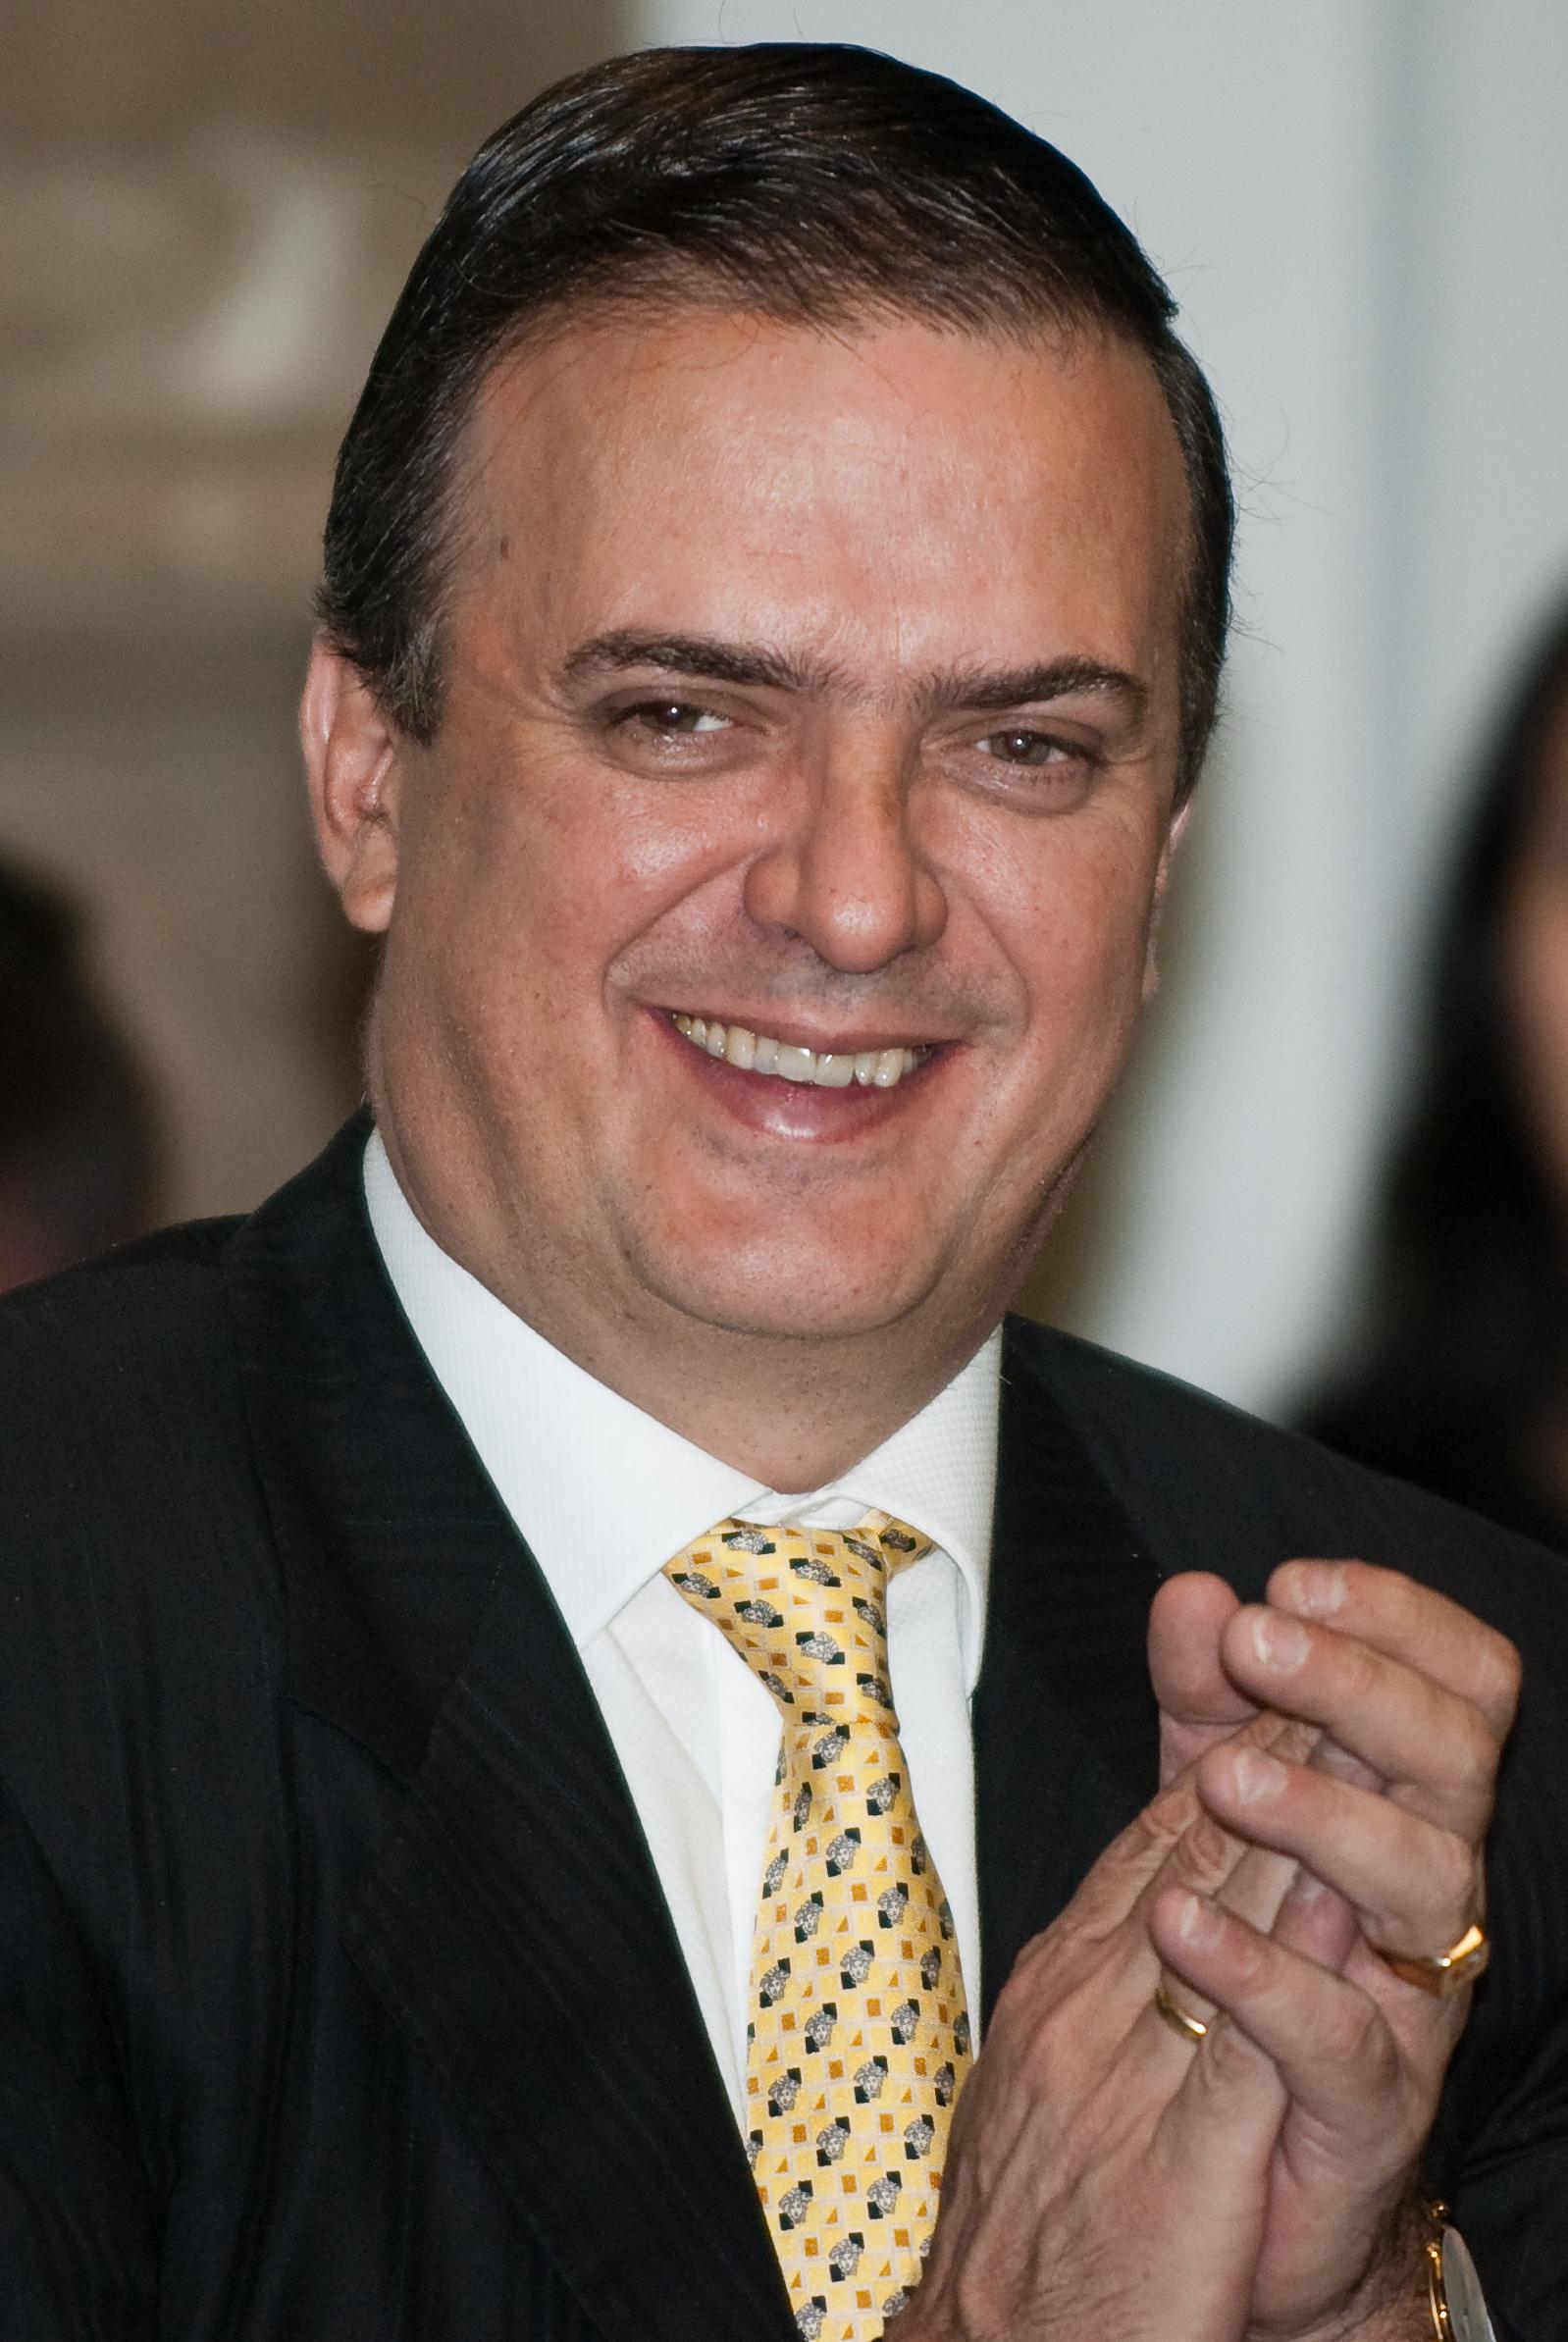 Beskrivning Marcelo Ebrard 2010.jpg